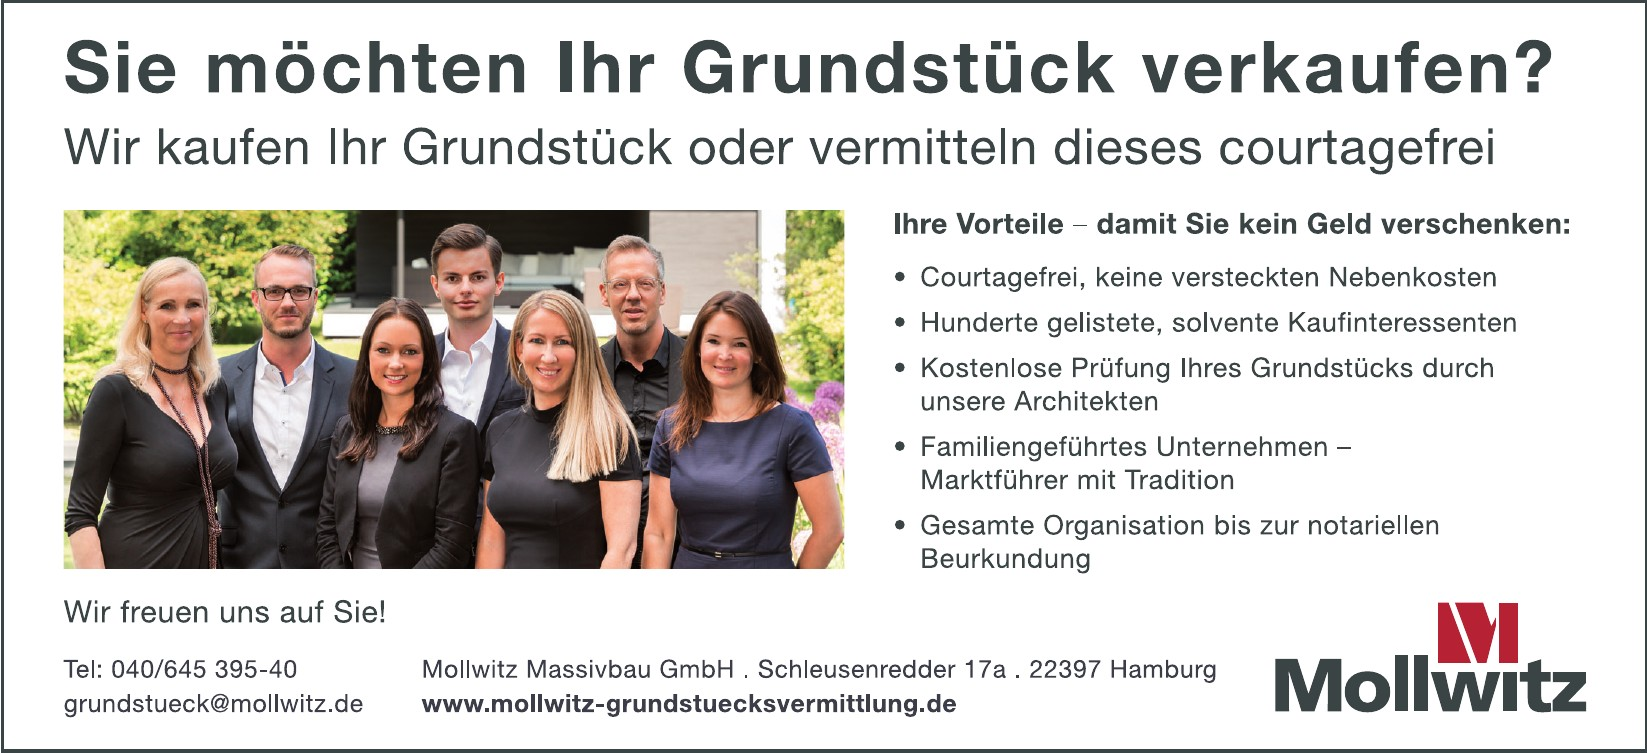 Mollwitz Massivbau GmbH